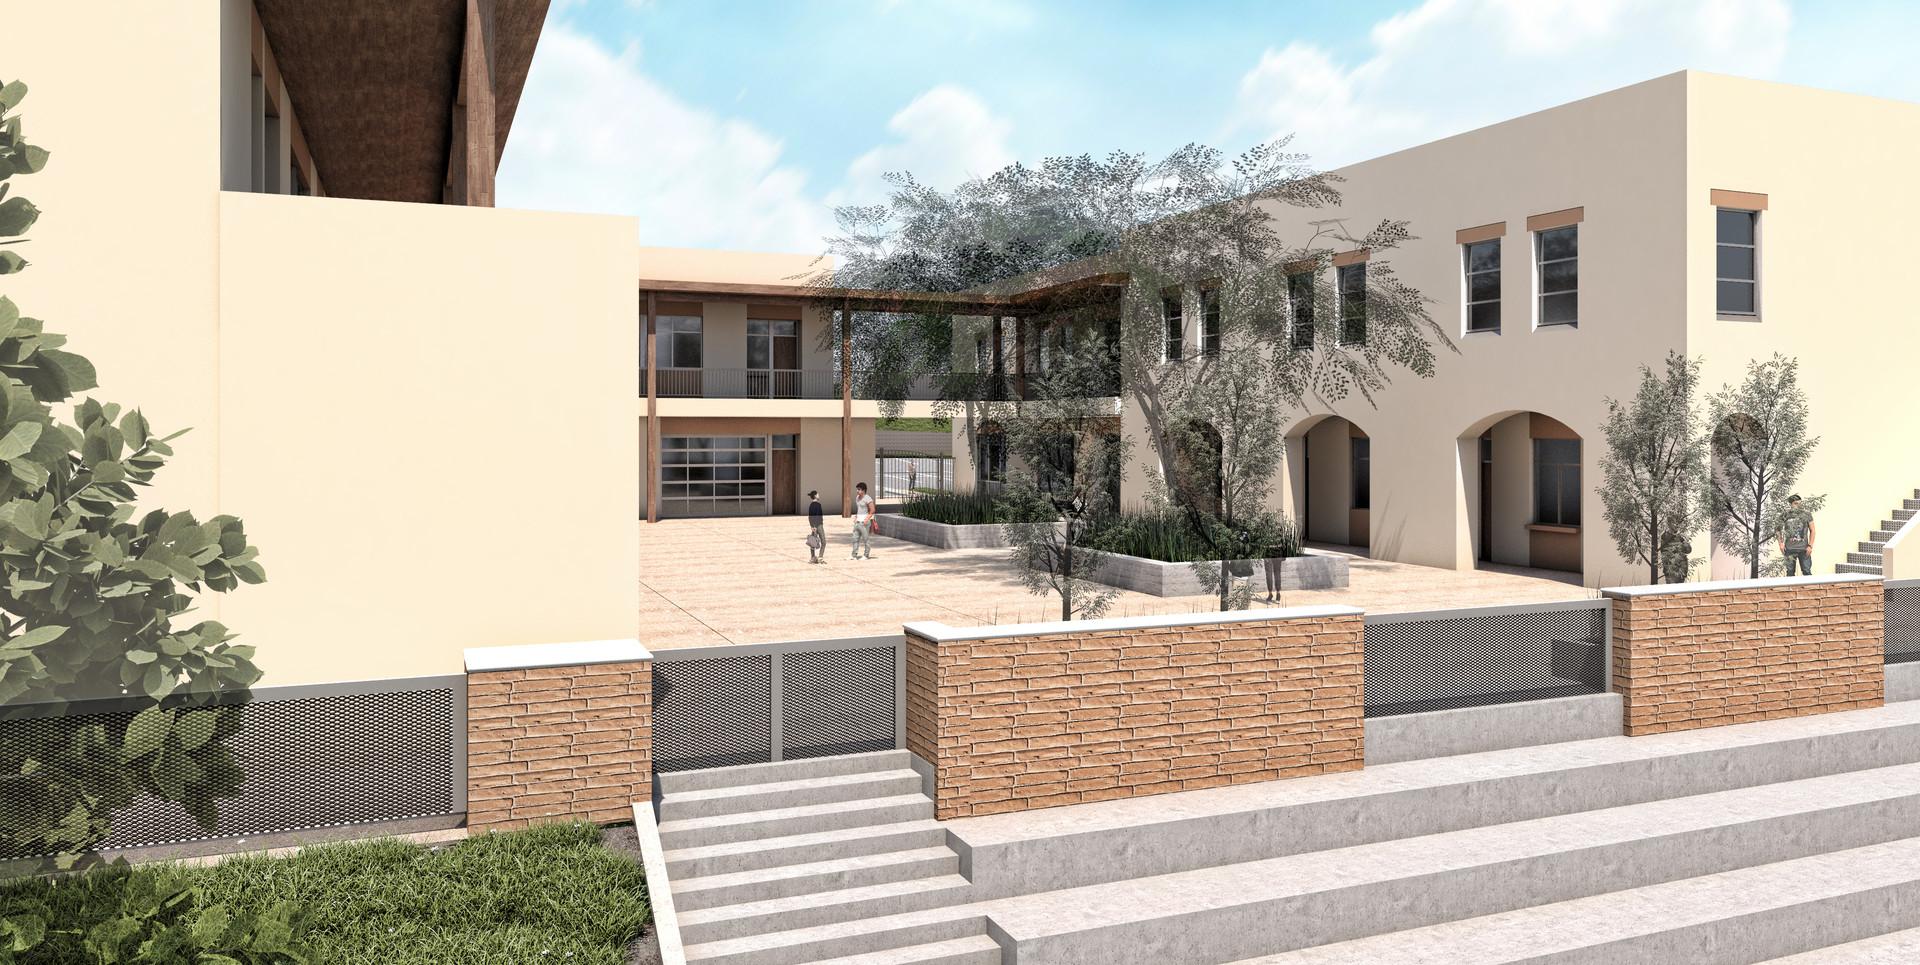 PCA-Architecture-Education-San-Diego-Lib